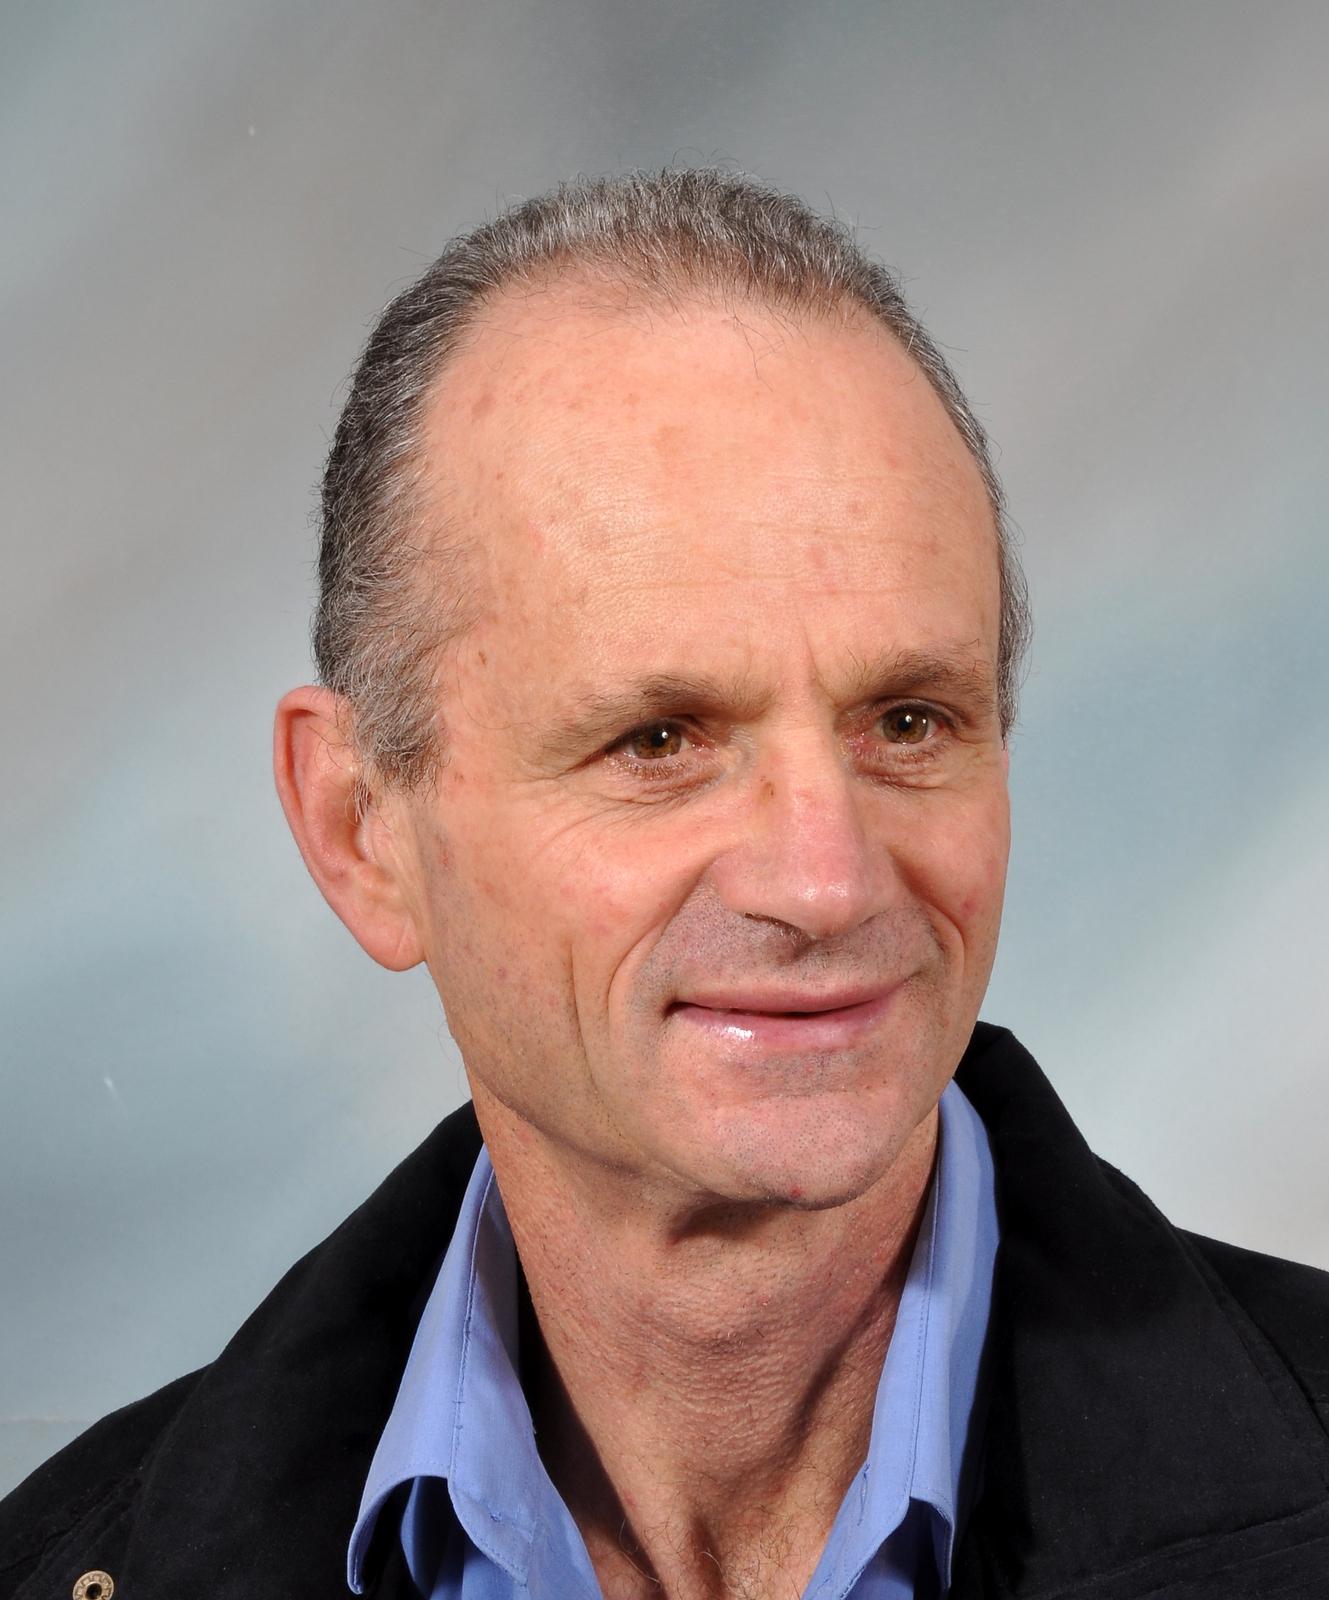 Dr. Roy Krawitz